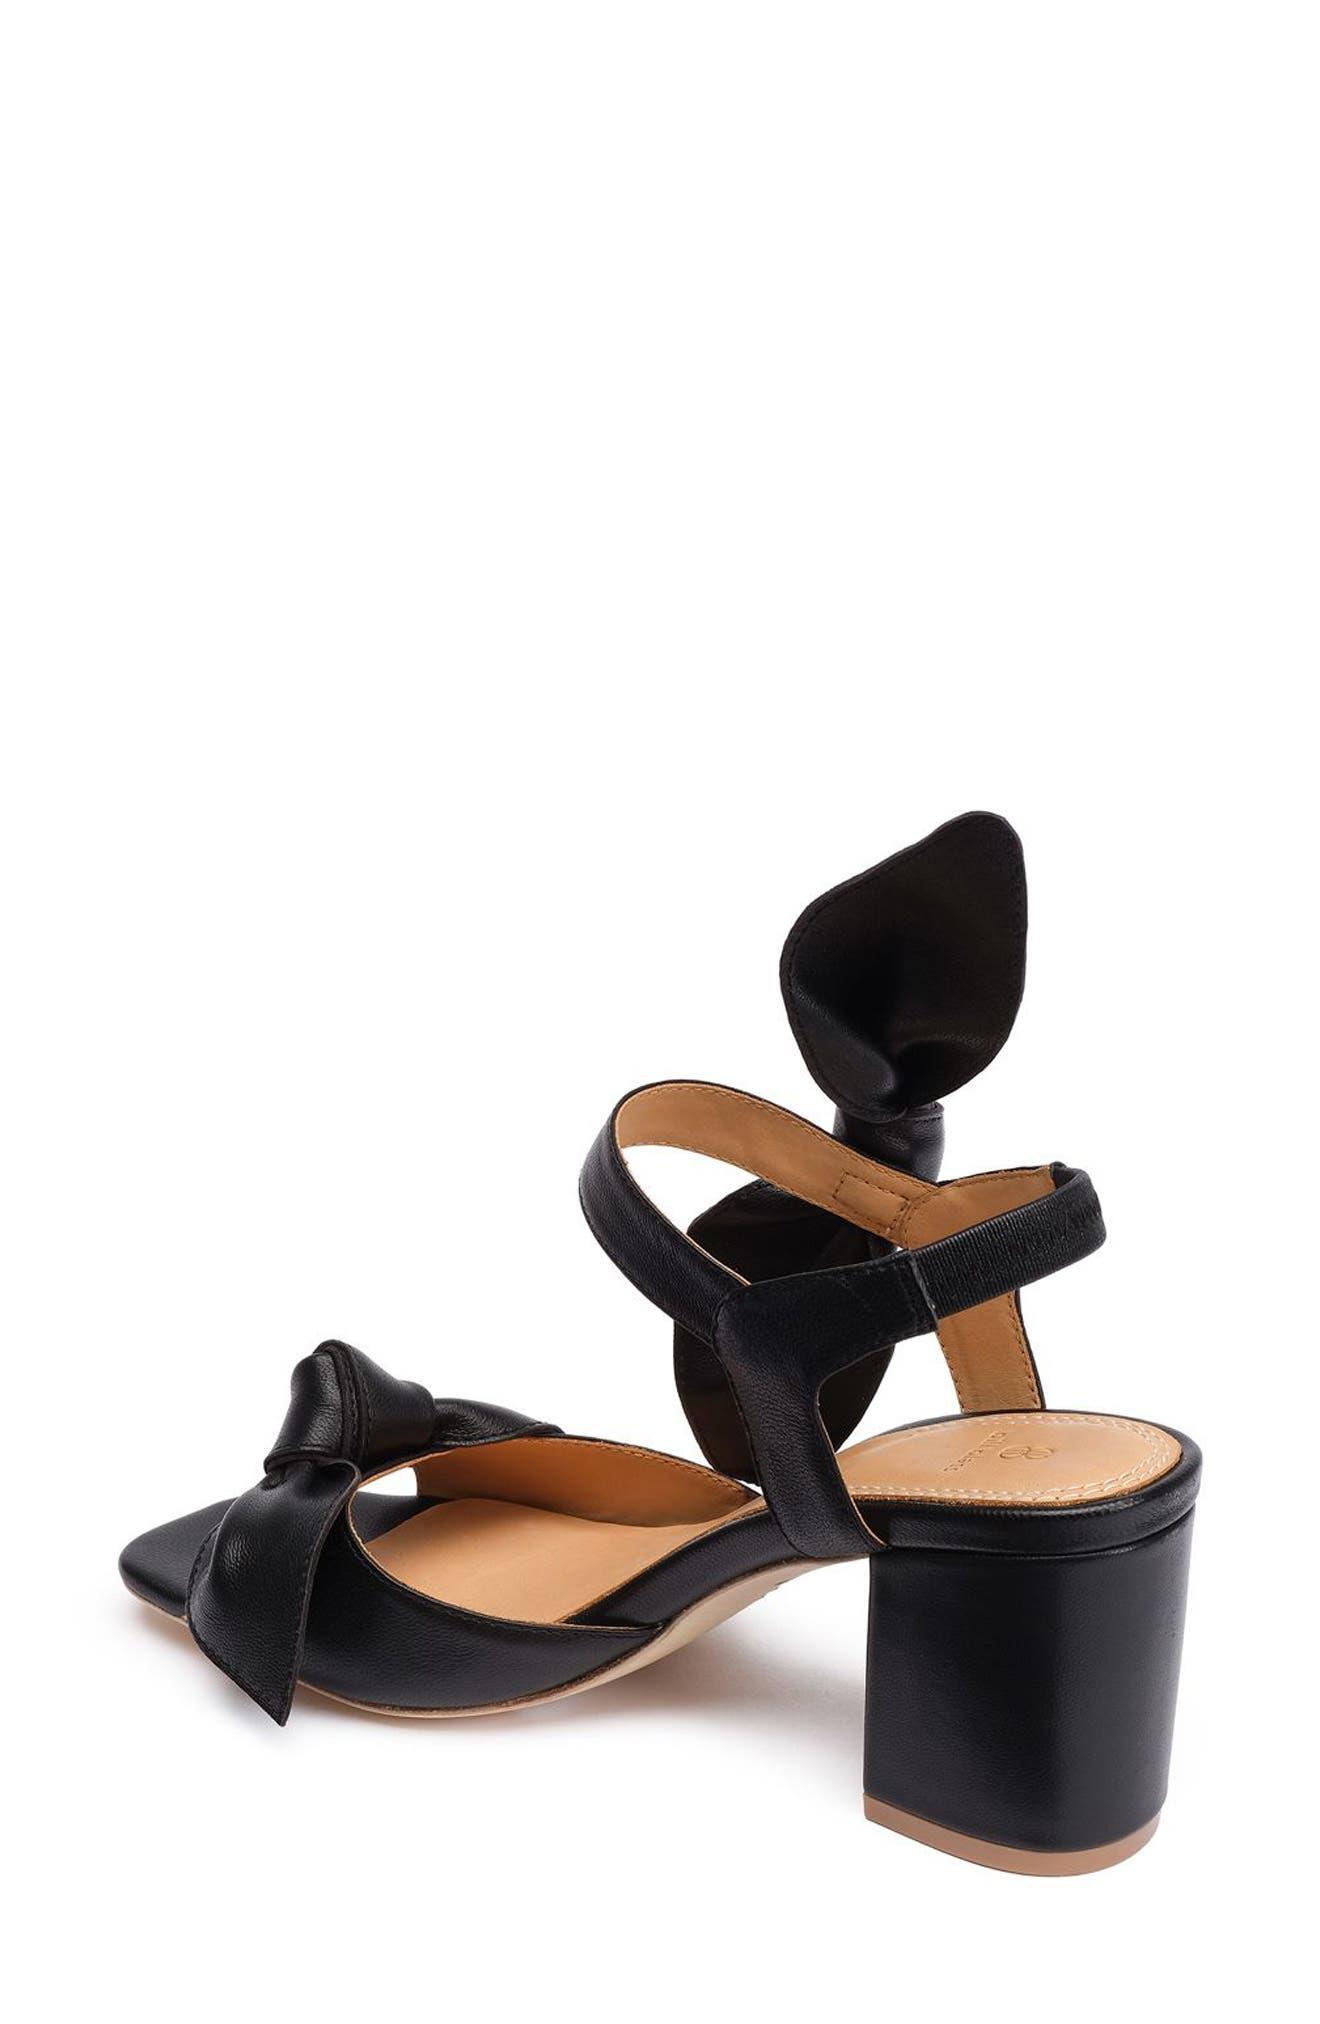 Carmen 65 Knotted Sandal,                             Alternate thumbnail 2, color,                             001